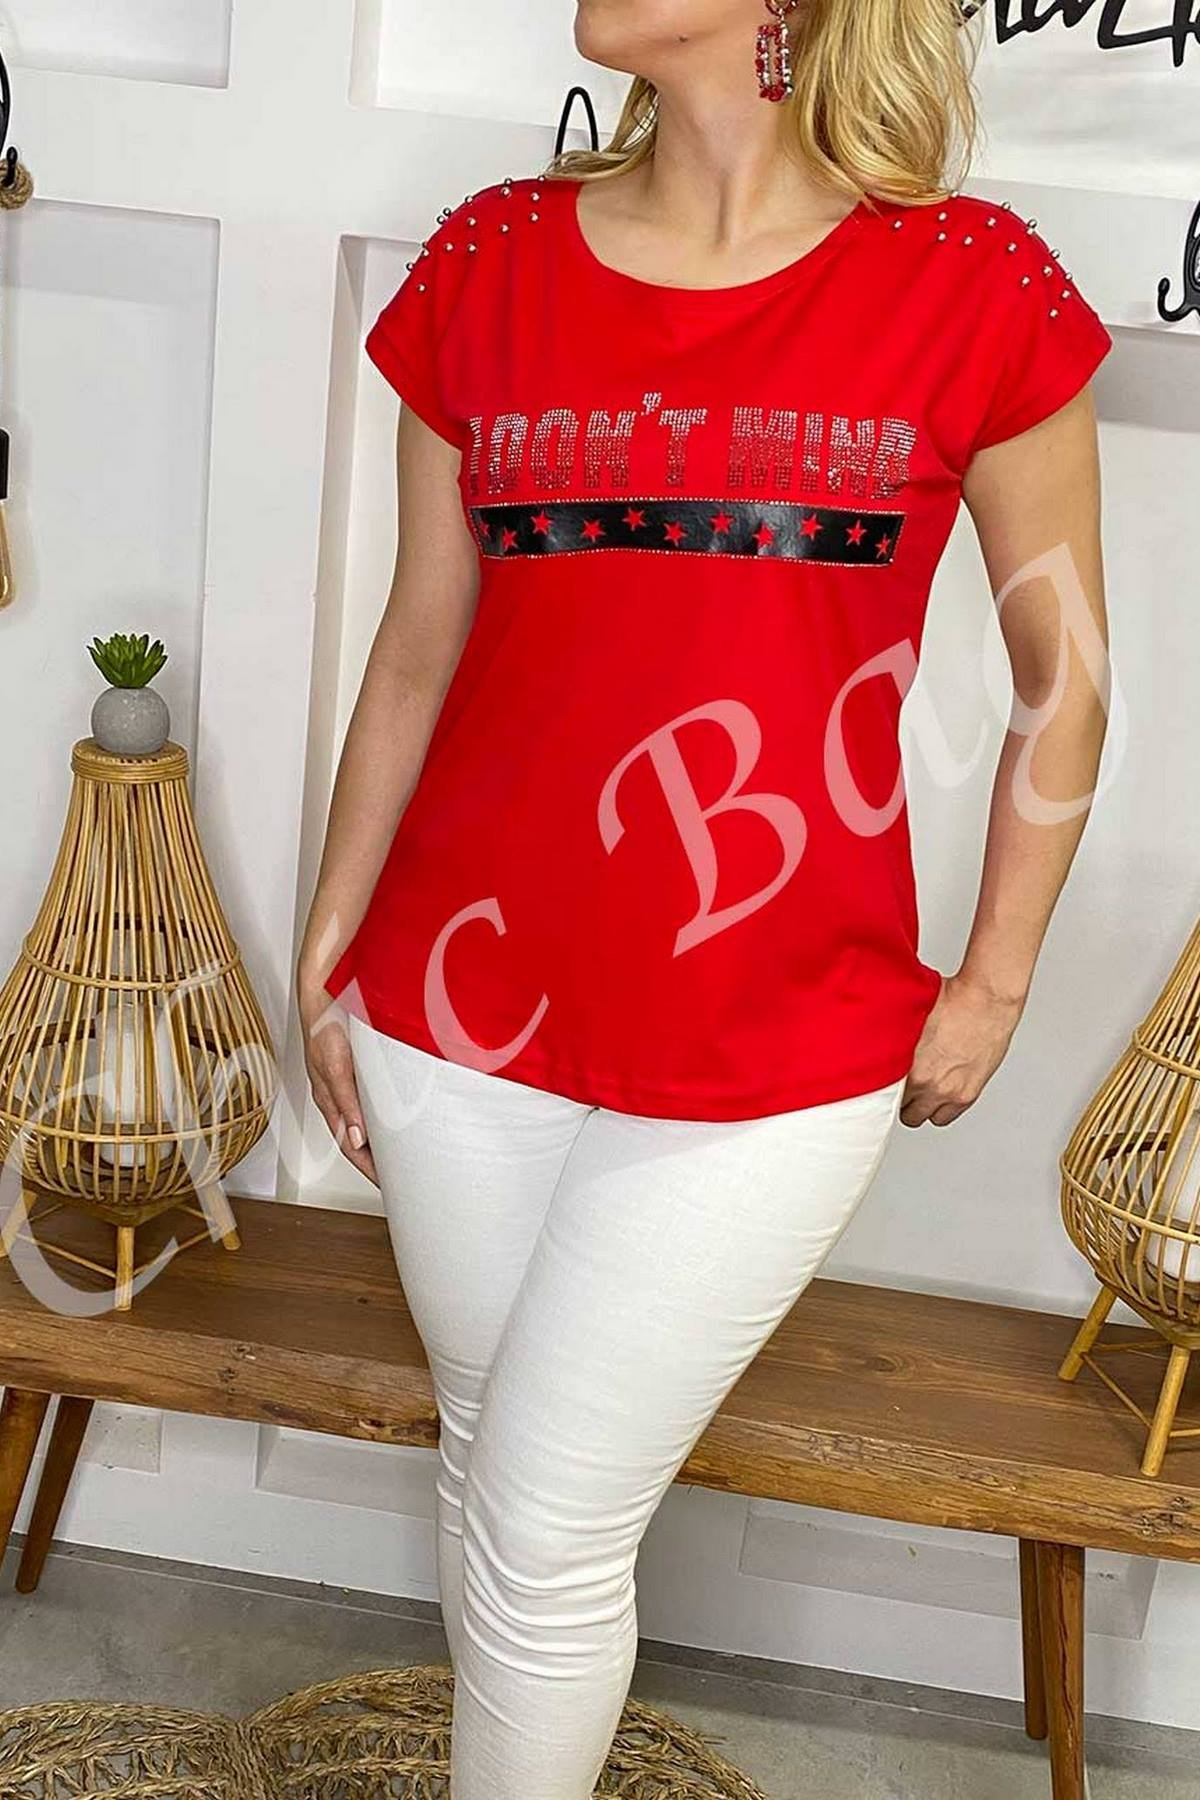 https://resim.chicbag.com.tr/p000955/krz/i-dont-mind-baski-t-shirt-swns-01df4f8b51aa.